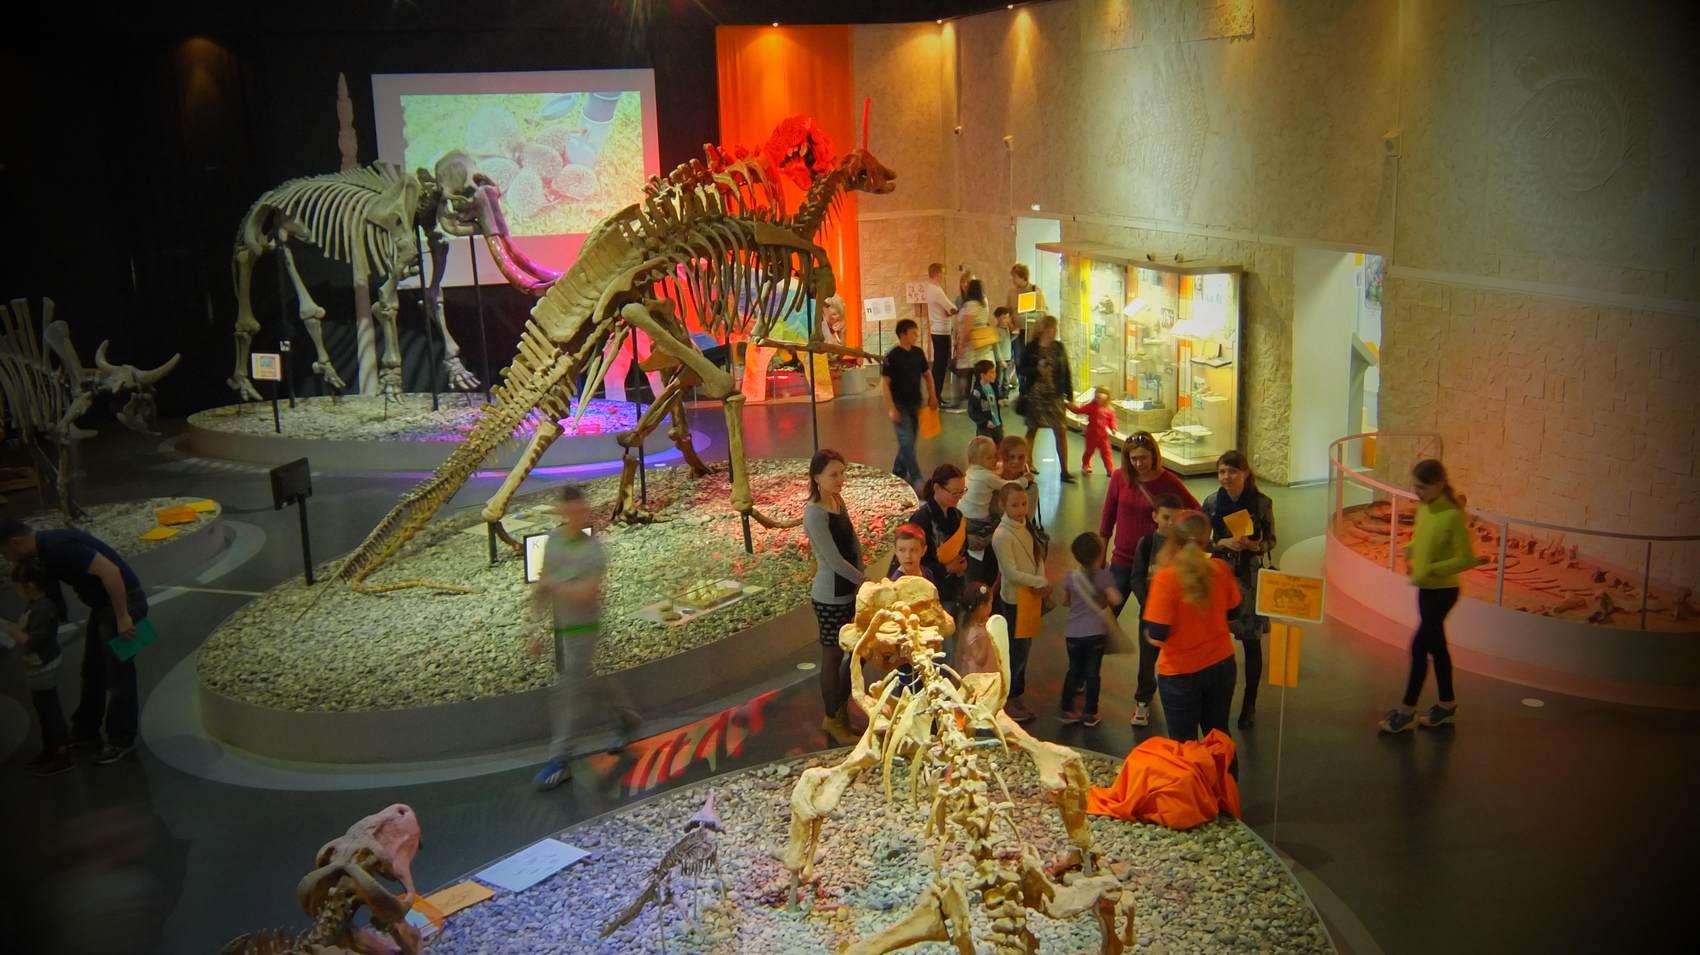 скелет мамонта в музее древностей